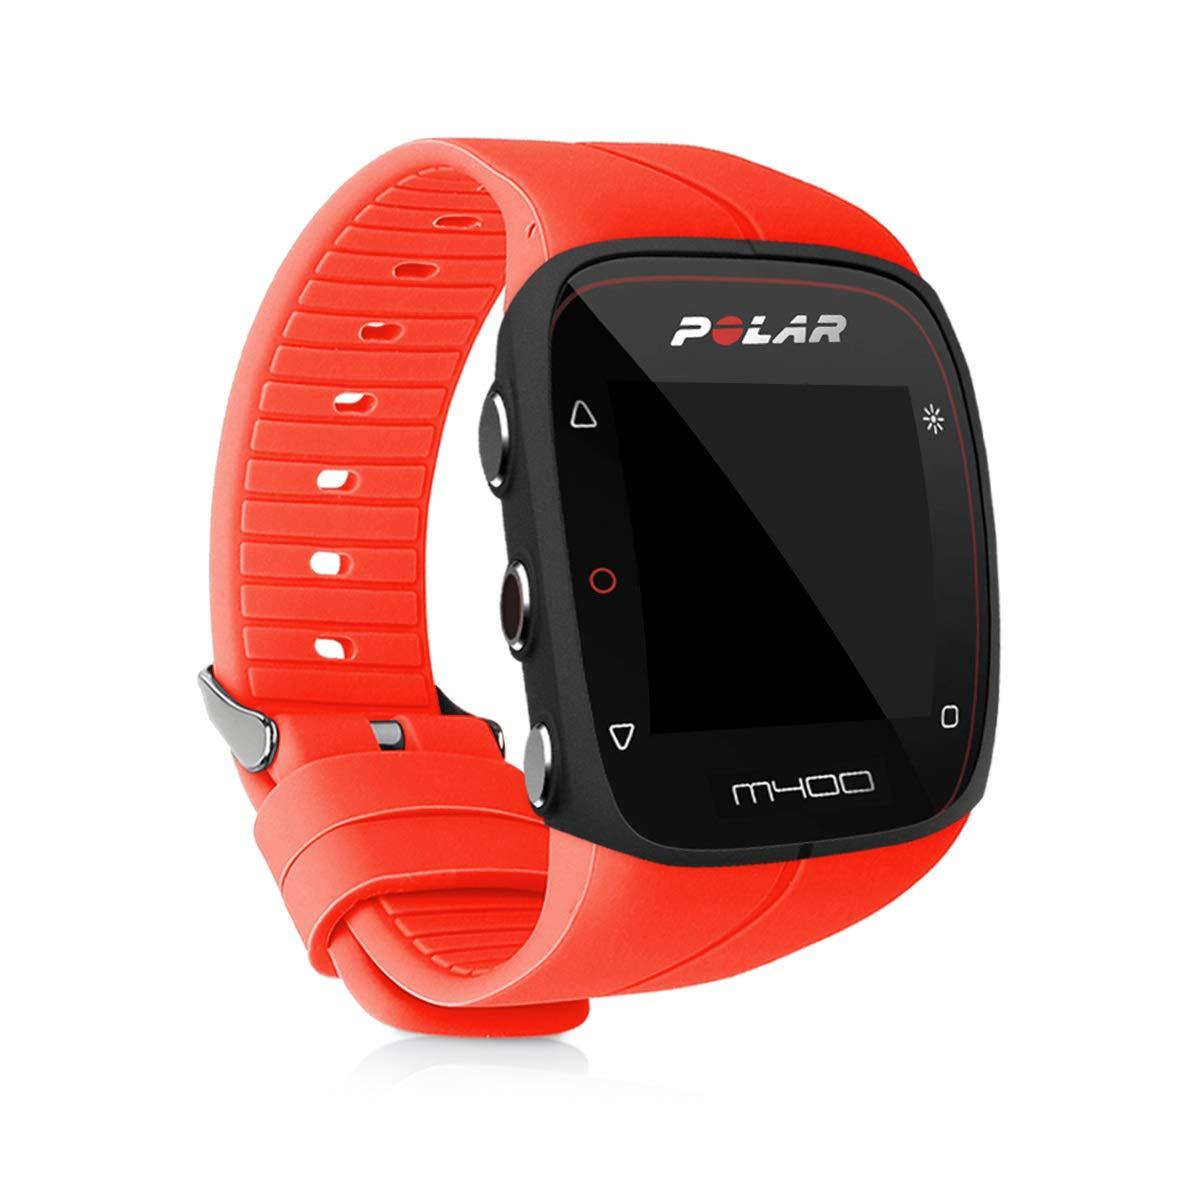 kwmobile Pulsera para Polar M400 / M430 - Brazalete de Silicona en Rojo sin Fitness Tracker